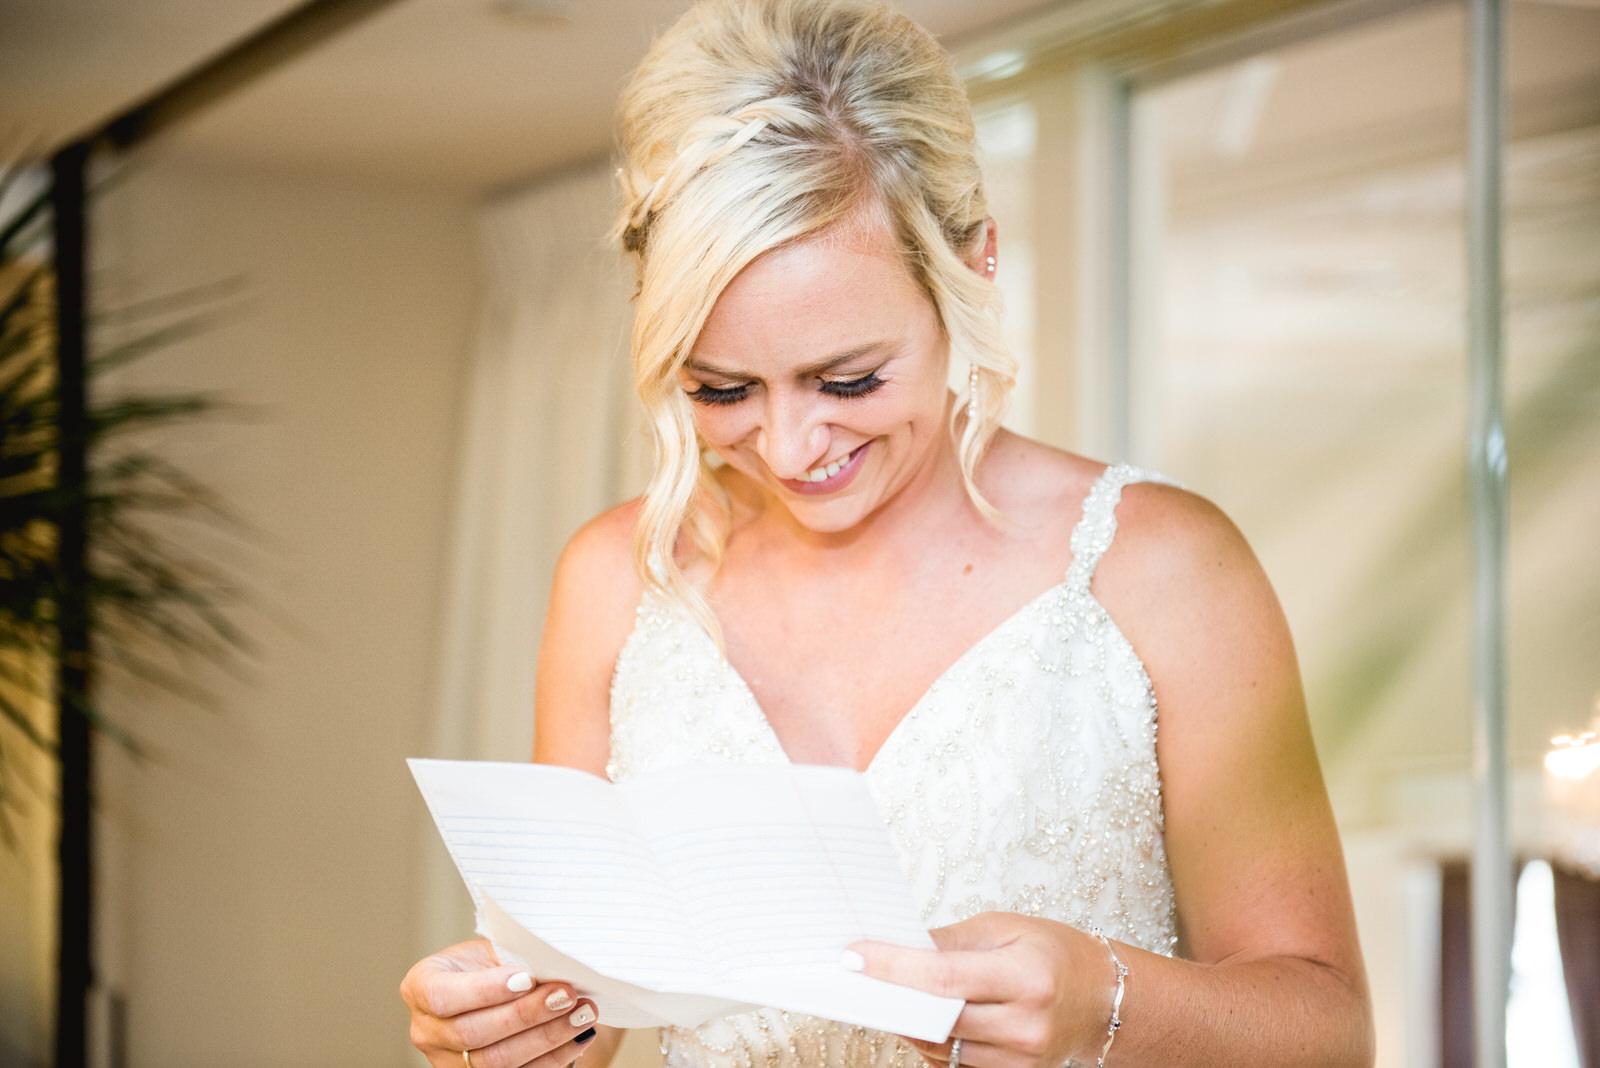 university_club_pittsburgh_wedding_photos_029.jpg